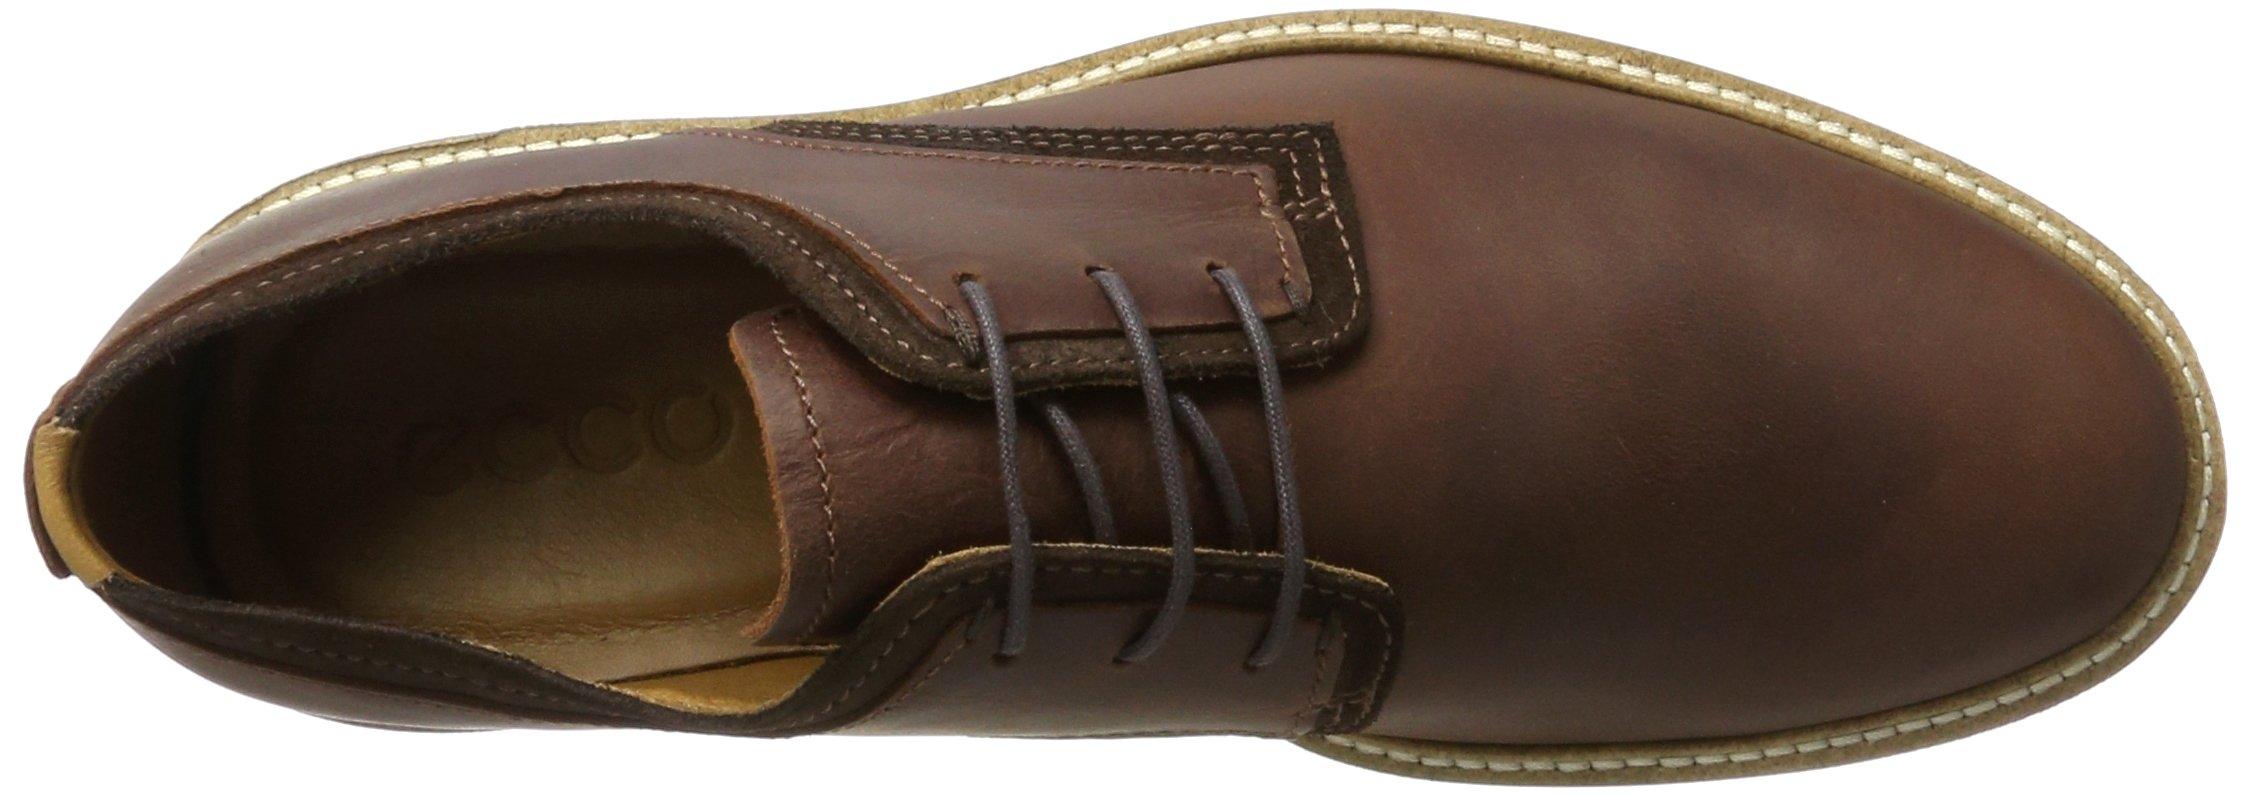 ECCO Men's Kenton Plain Toe Tie Oxford, Mink/Mocha Tan Welt, 47 EU/13-13.5 M US by ECCO (Image #7)